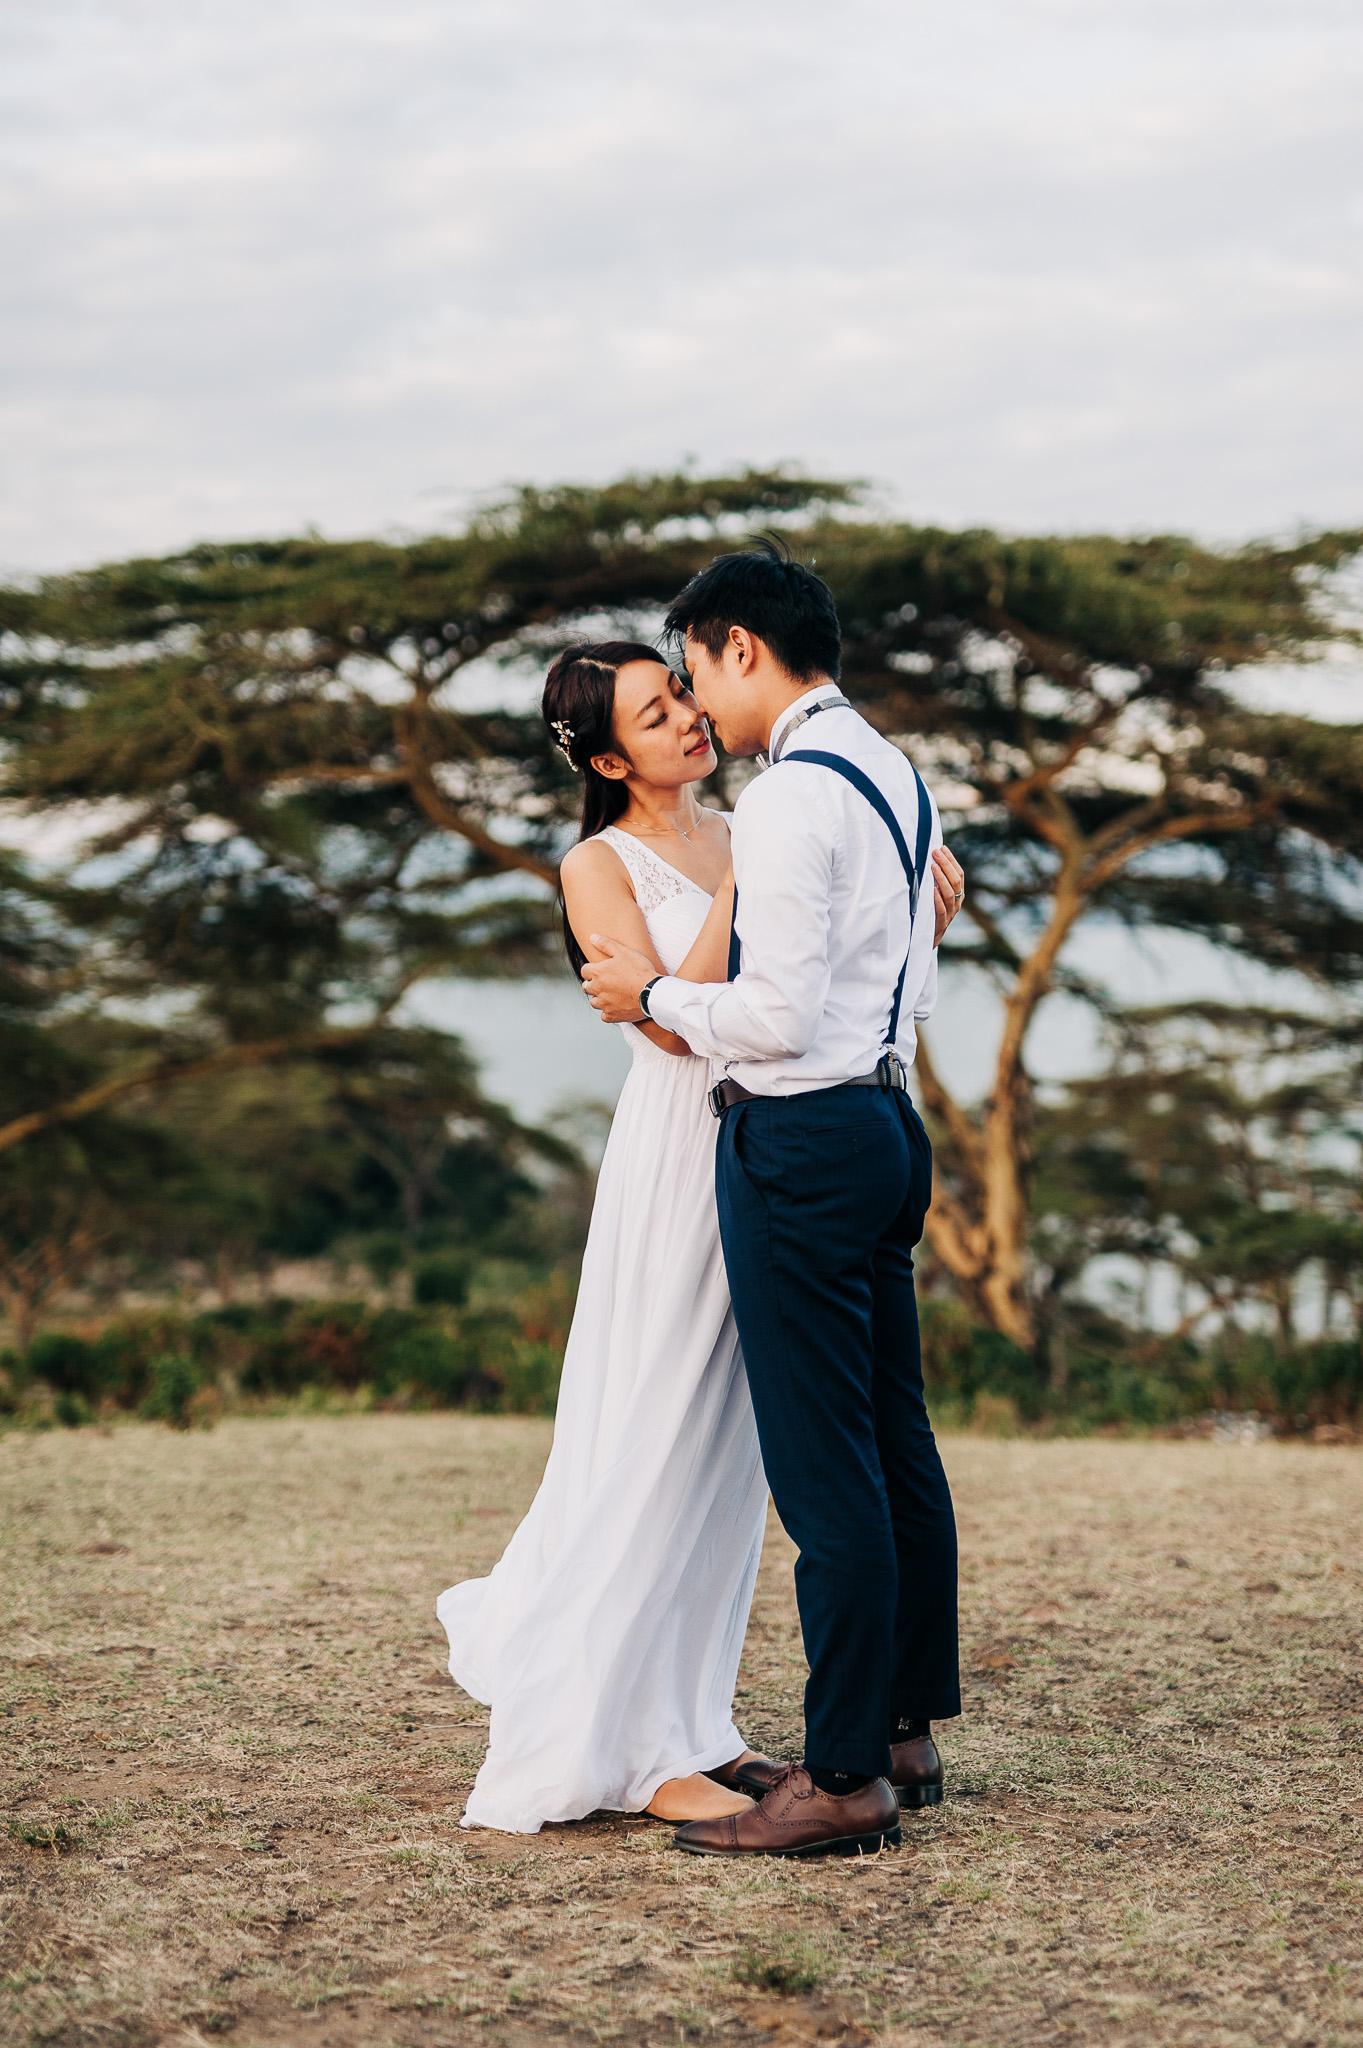 Anna-Hari-Photography-Safari-Elopement-Kenya-Wedding-Photographer-Kenya-94.jpg